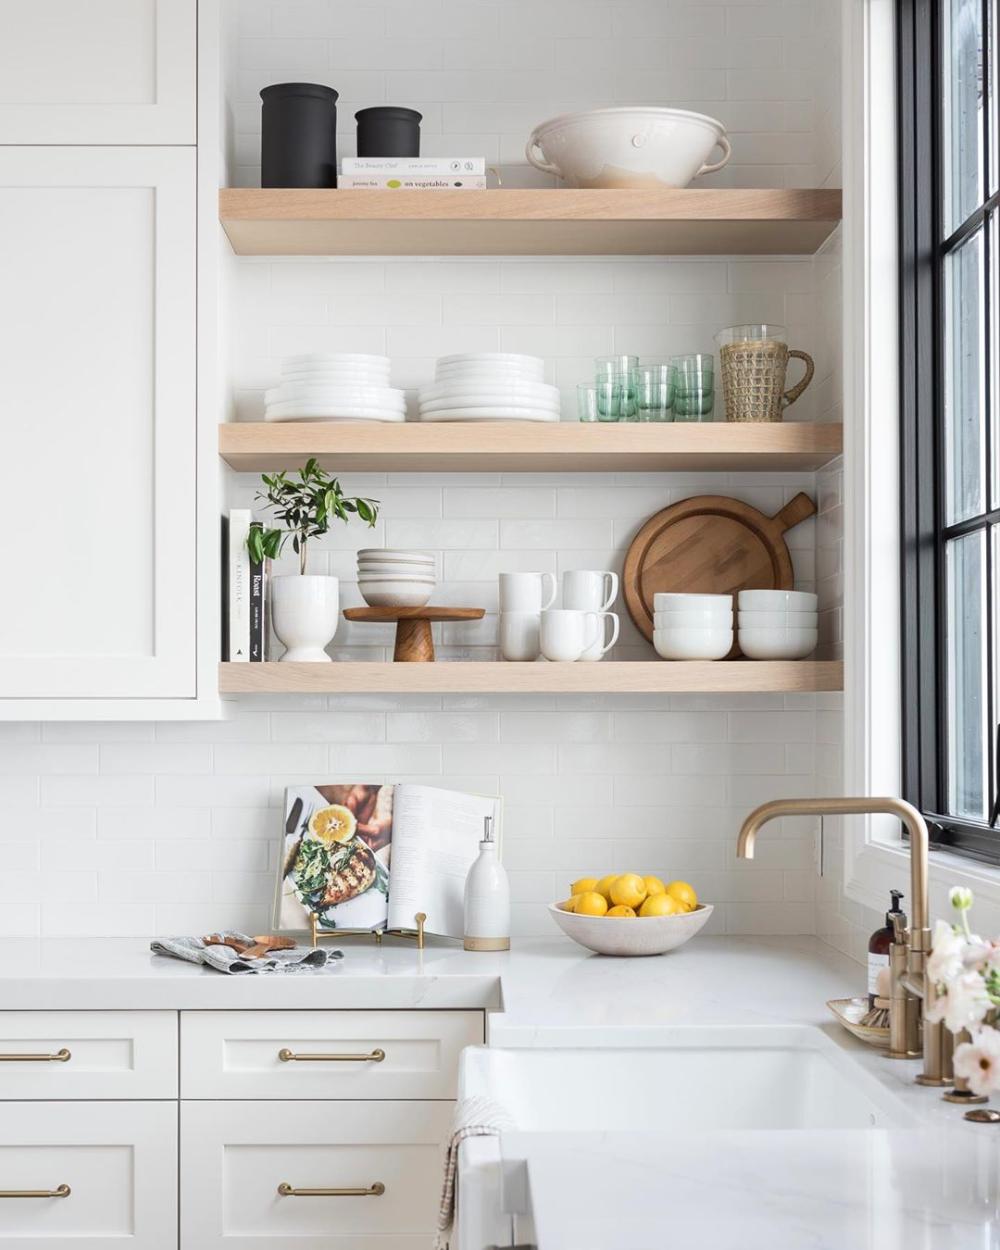 Christine Hellofashionblog Christineandrew Instagram Photos And Videos Farmhouse Kitchen Decor Home Kitchens Kitchen